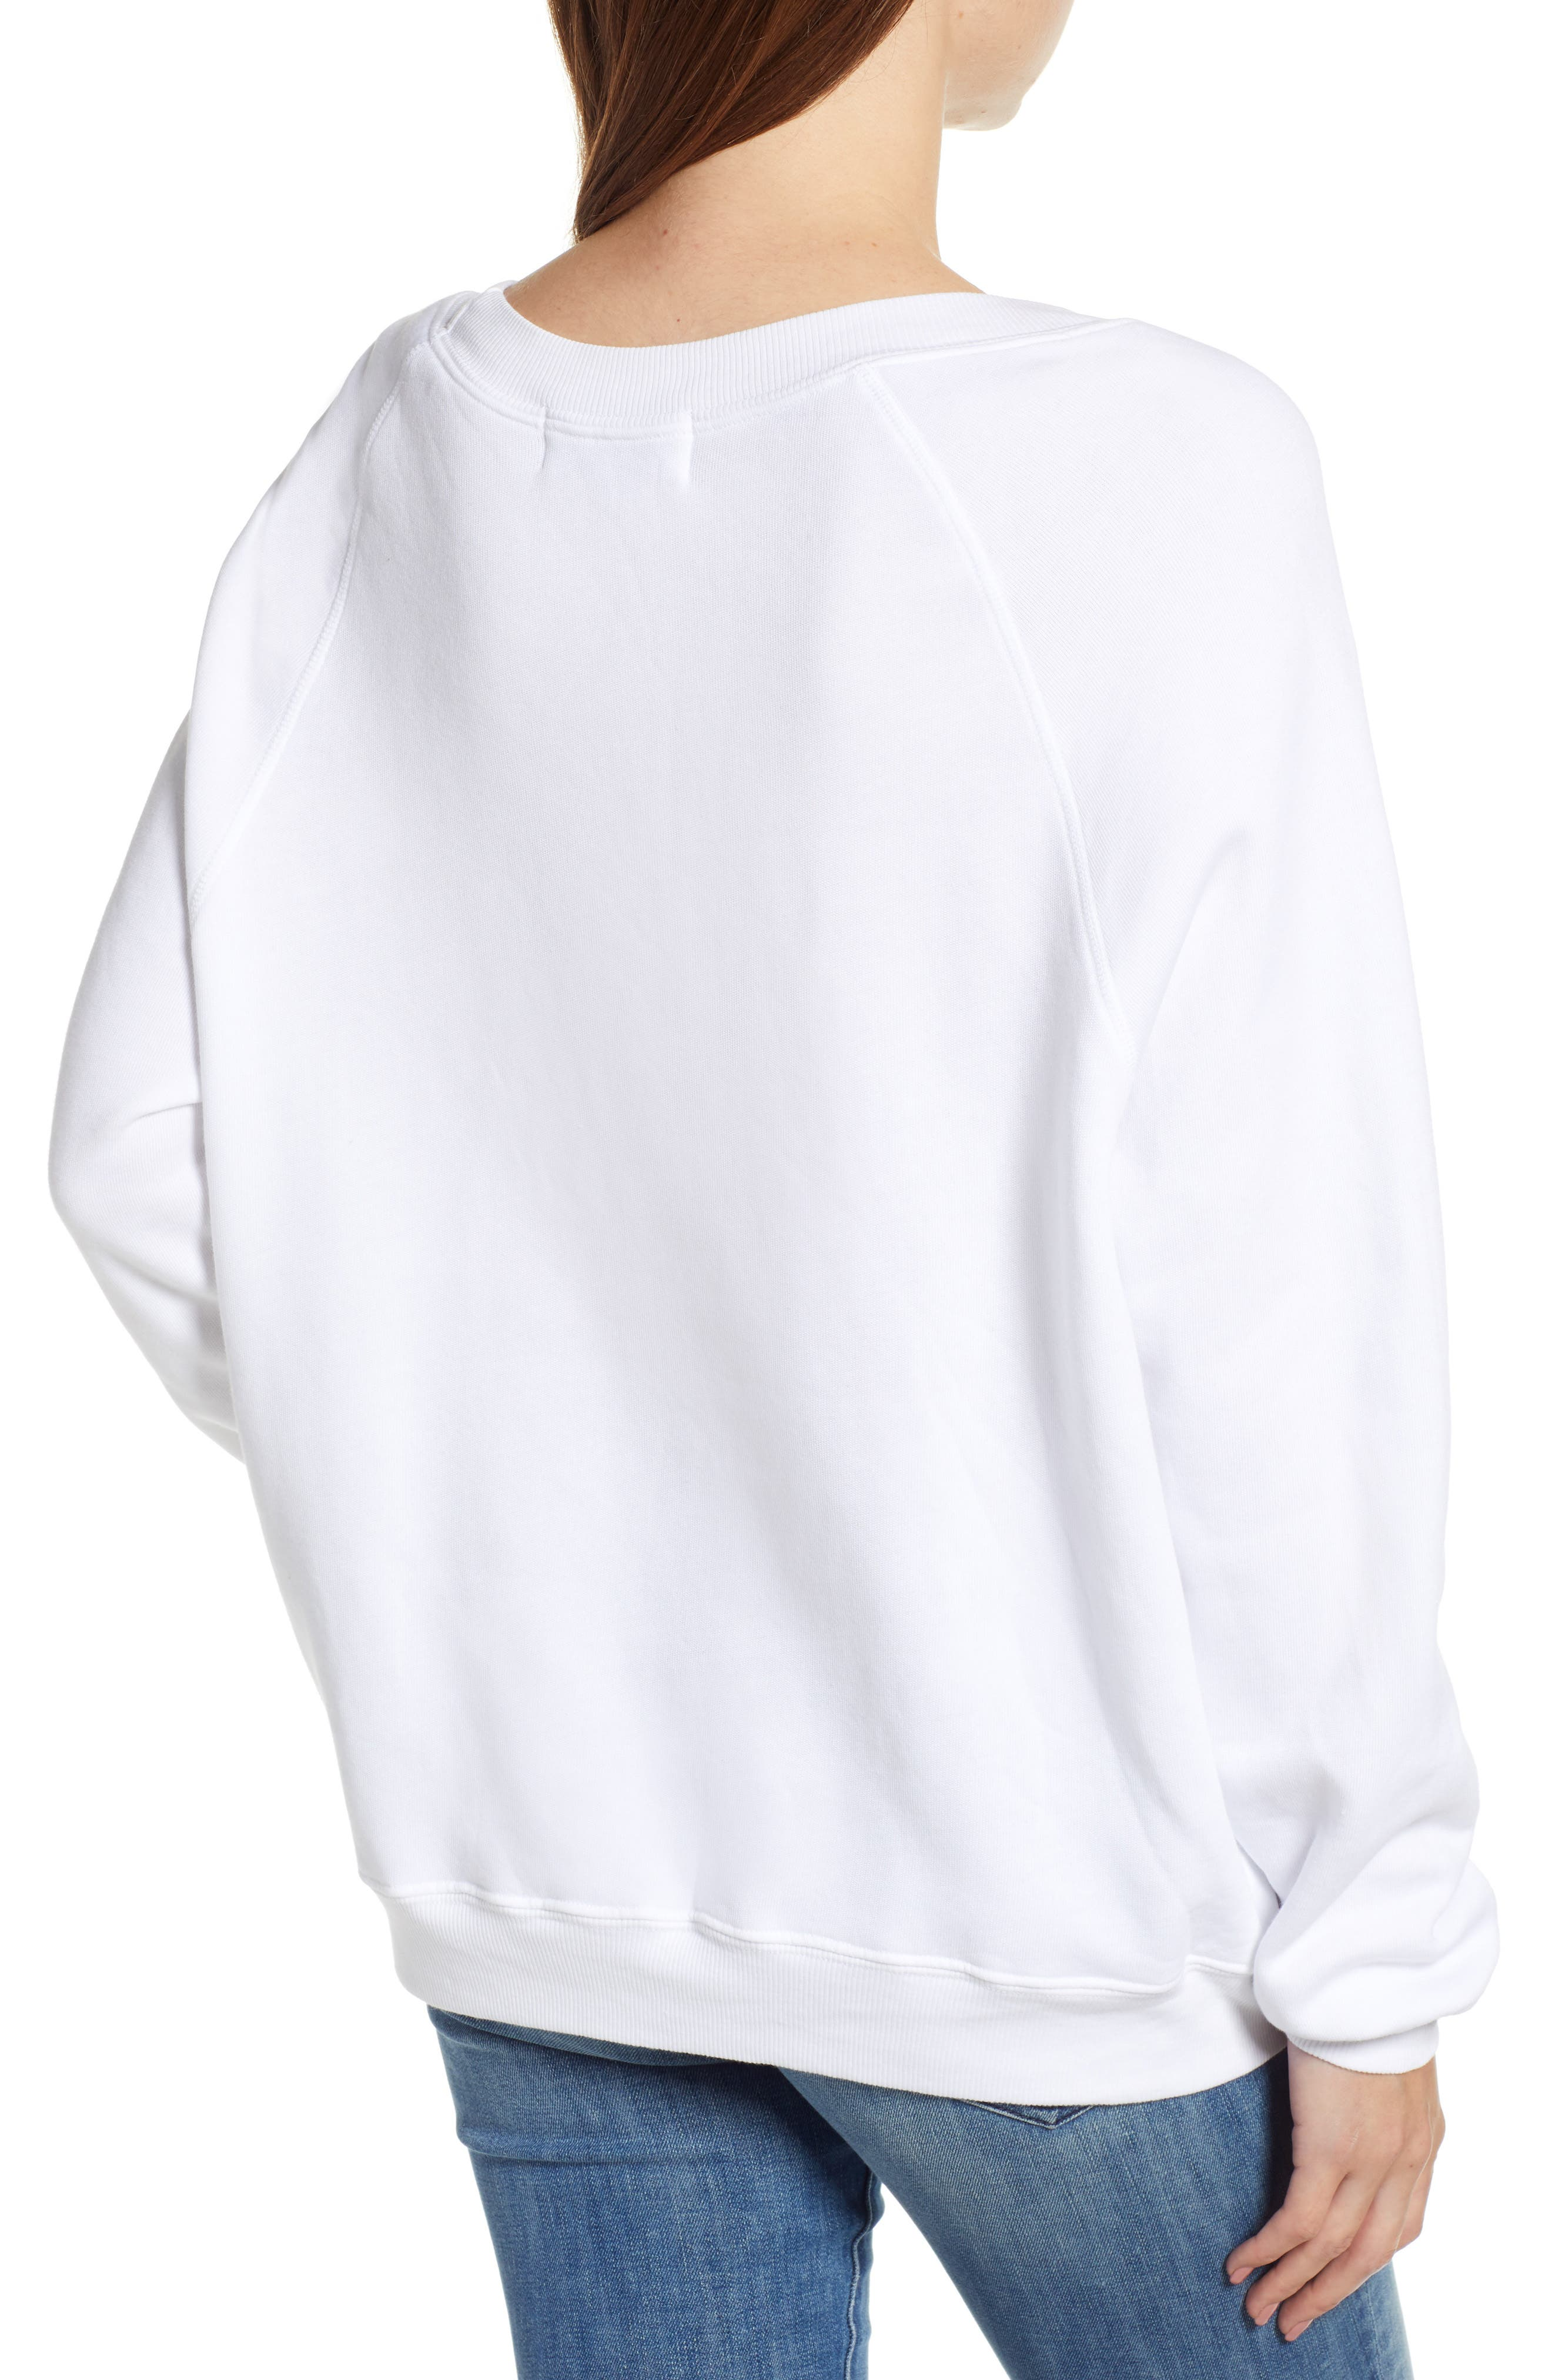 Snowy Tropics Sommers Sweatshirt,                             Alternate thumbnail 2, color,                             CLEAN WHITE